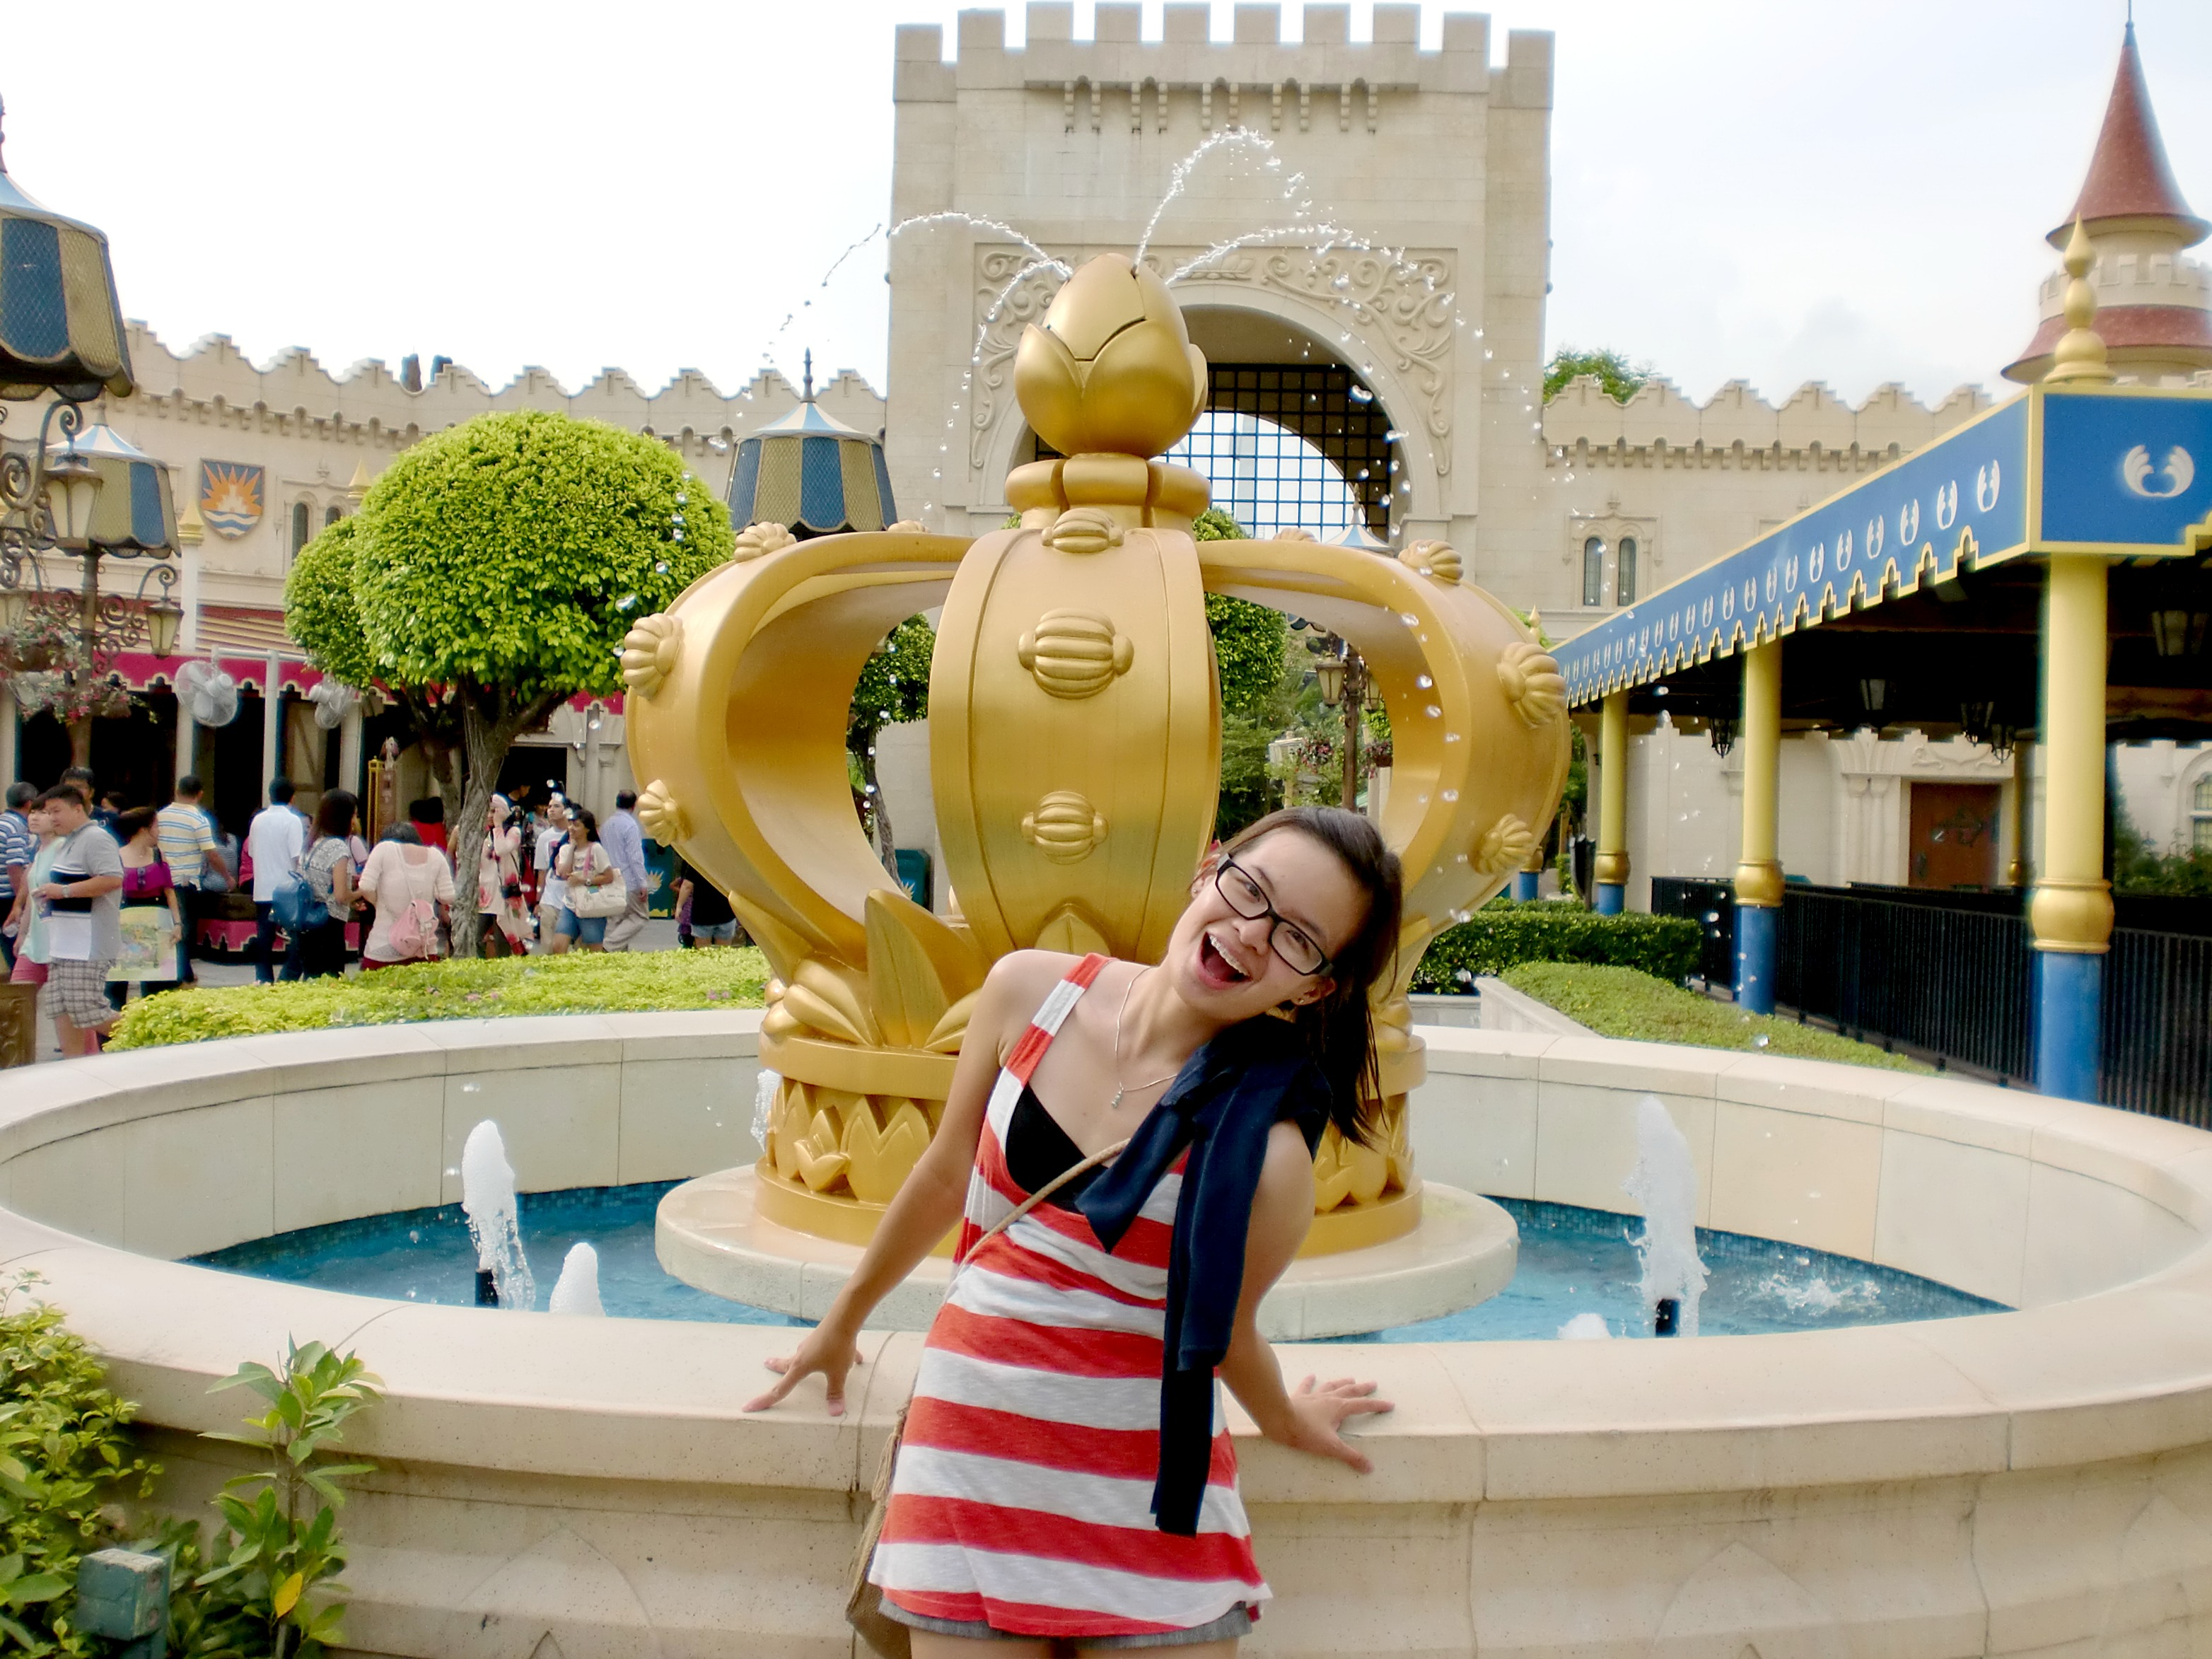 A Day In The Movies Universal Studio Singapore Sharon Loh Tiket Singapura Anak Pinocchio Far Away